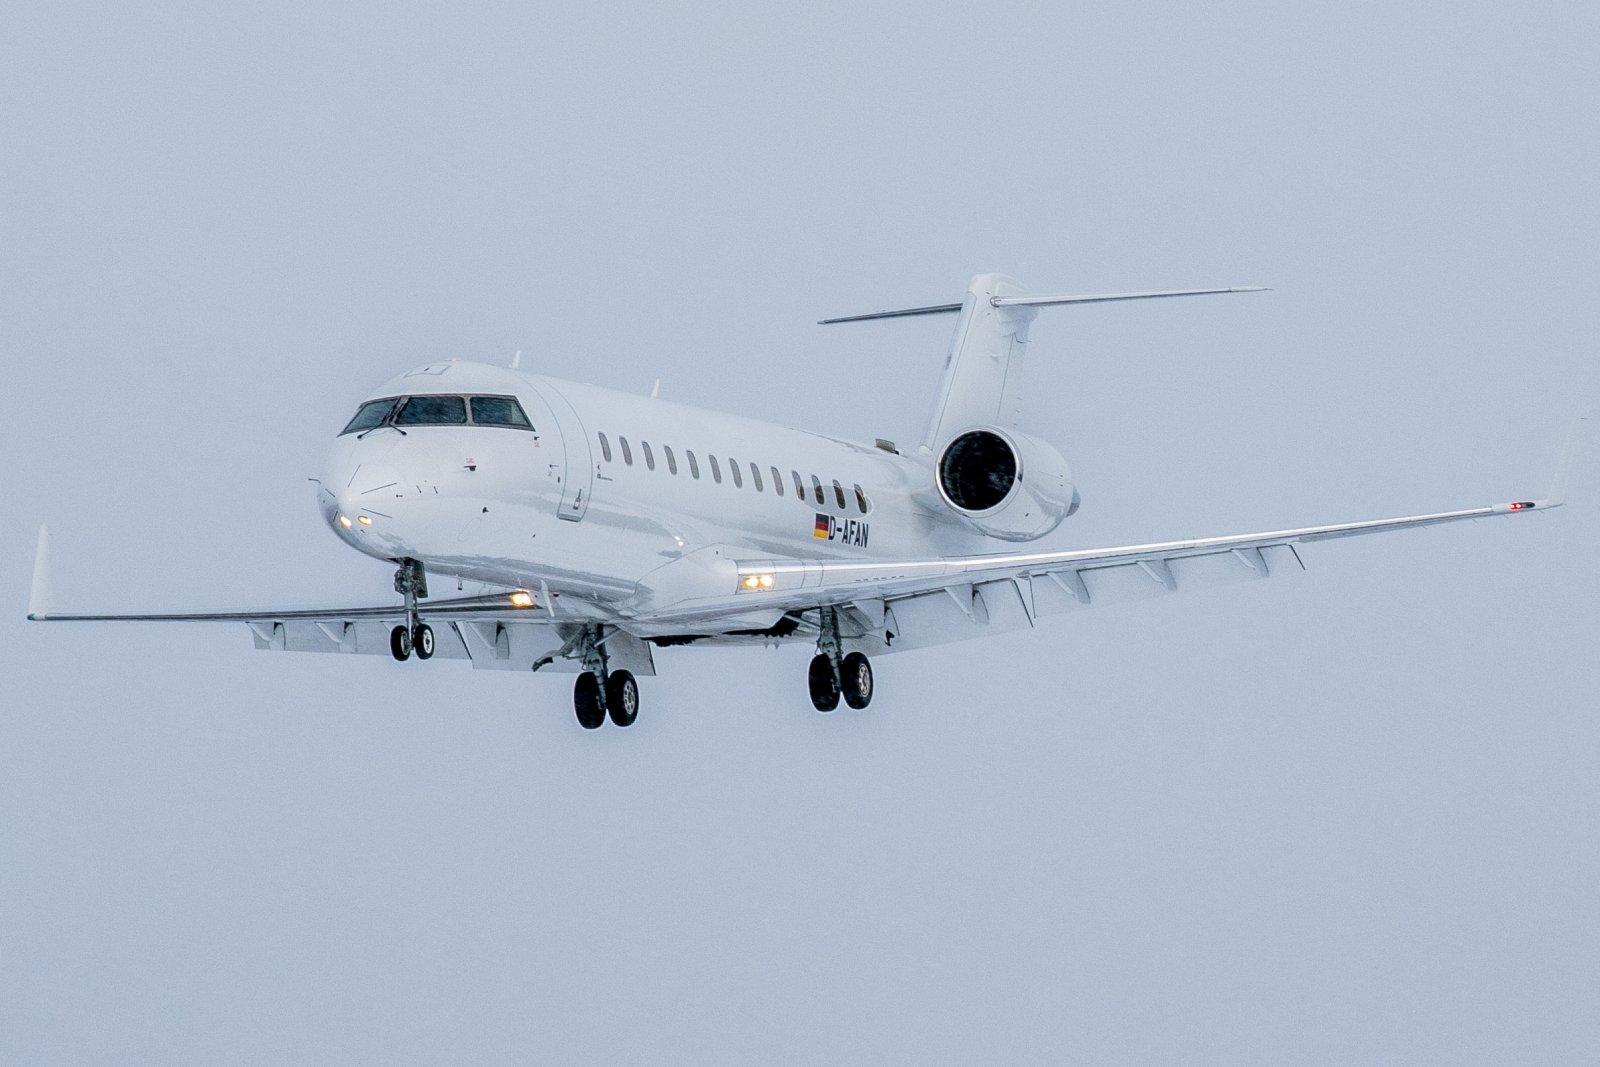 D-AFAN. Bombardier Challenger 850. 6.3.2020